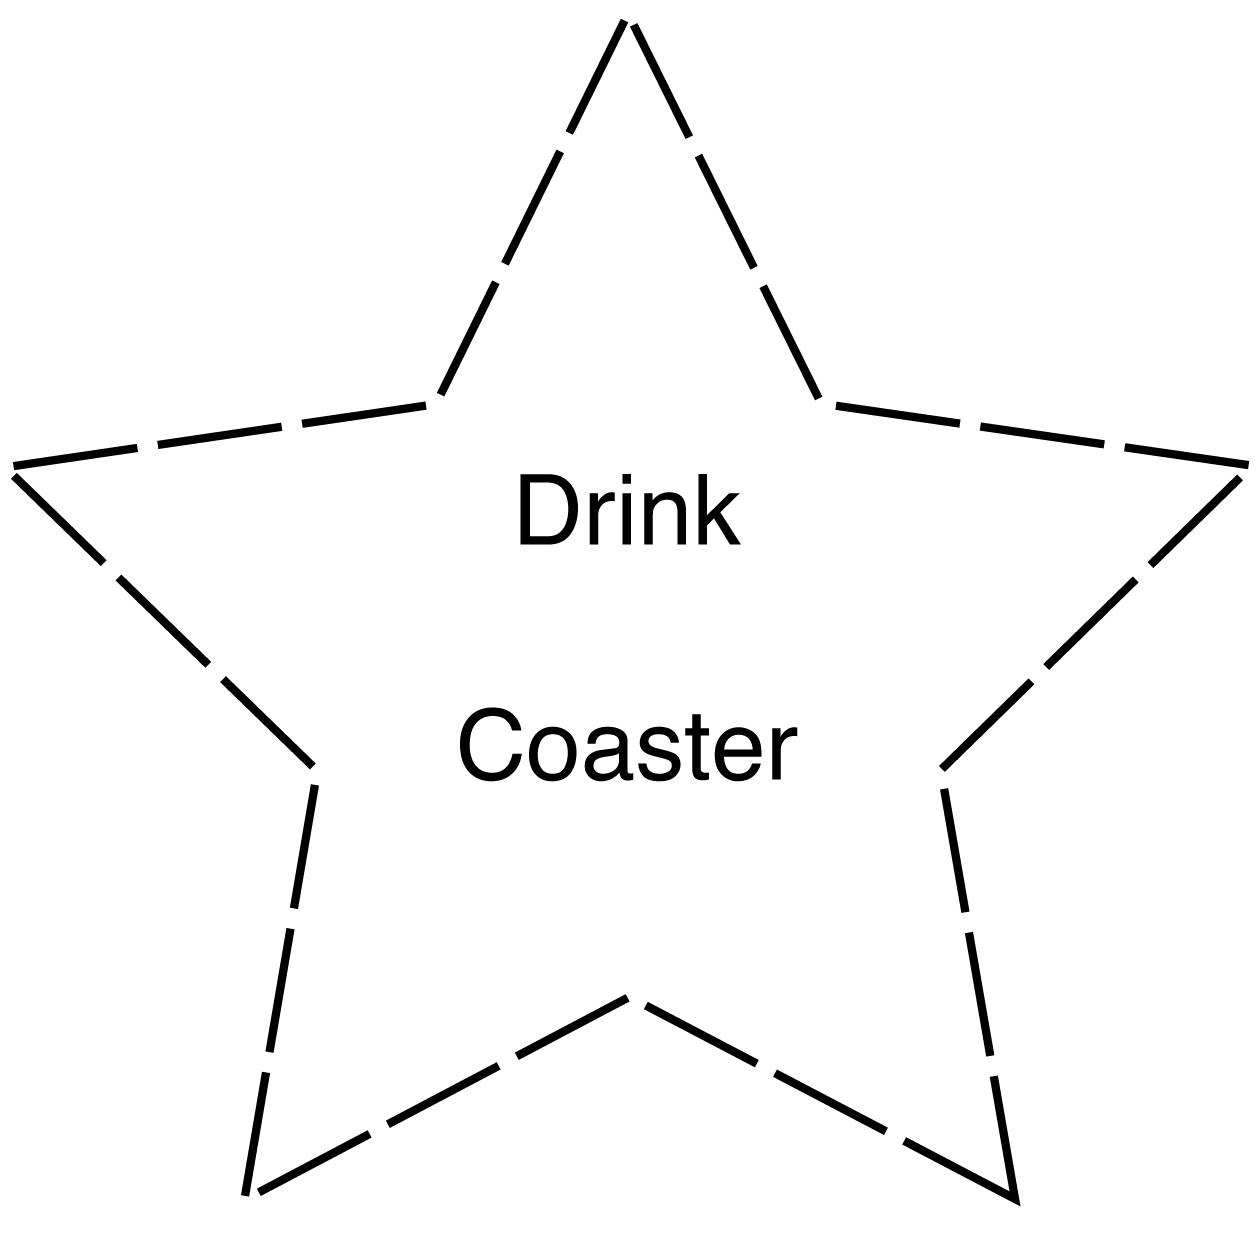 Free Printable Star, Download Free Clip Art, Free Clip Art On - Printable Star Puzzle